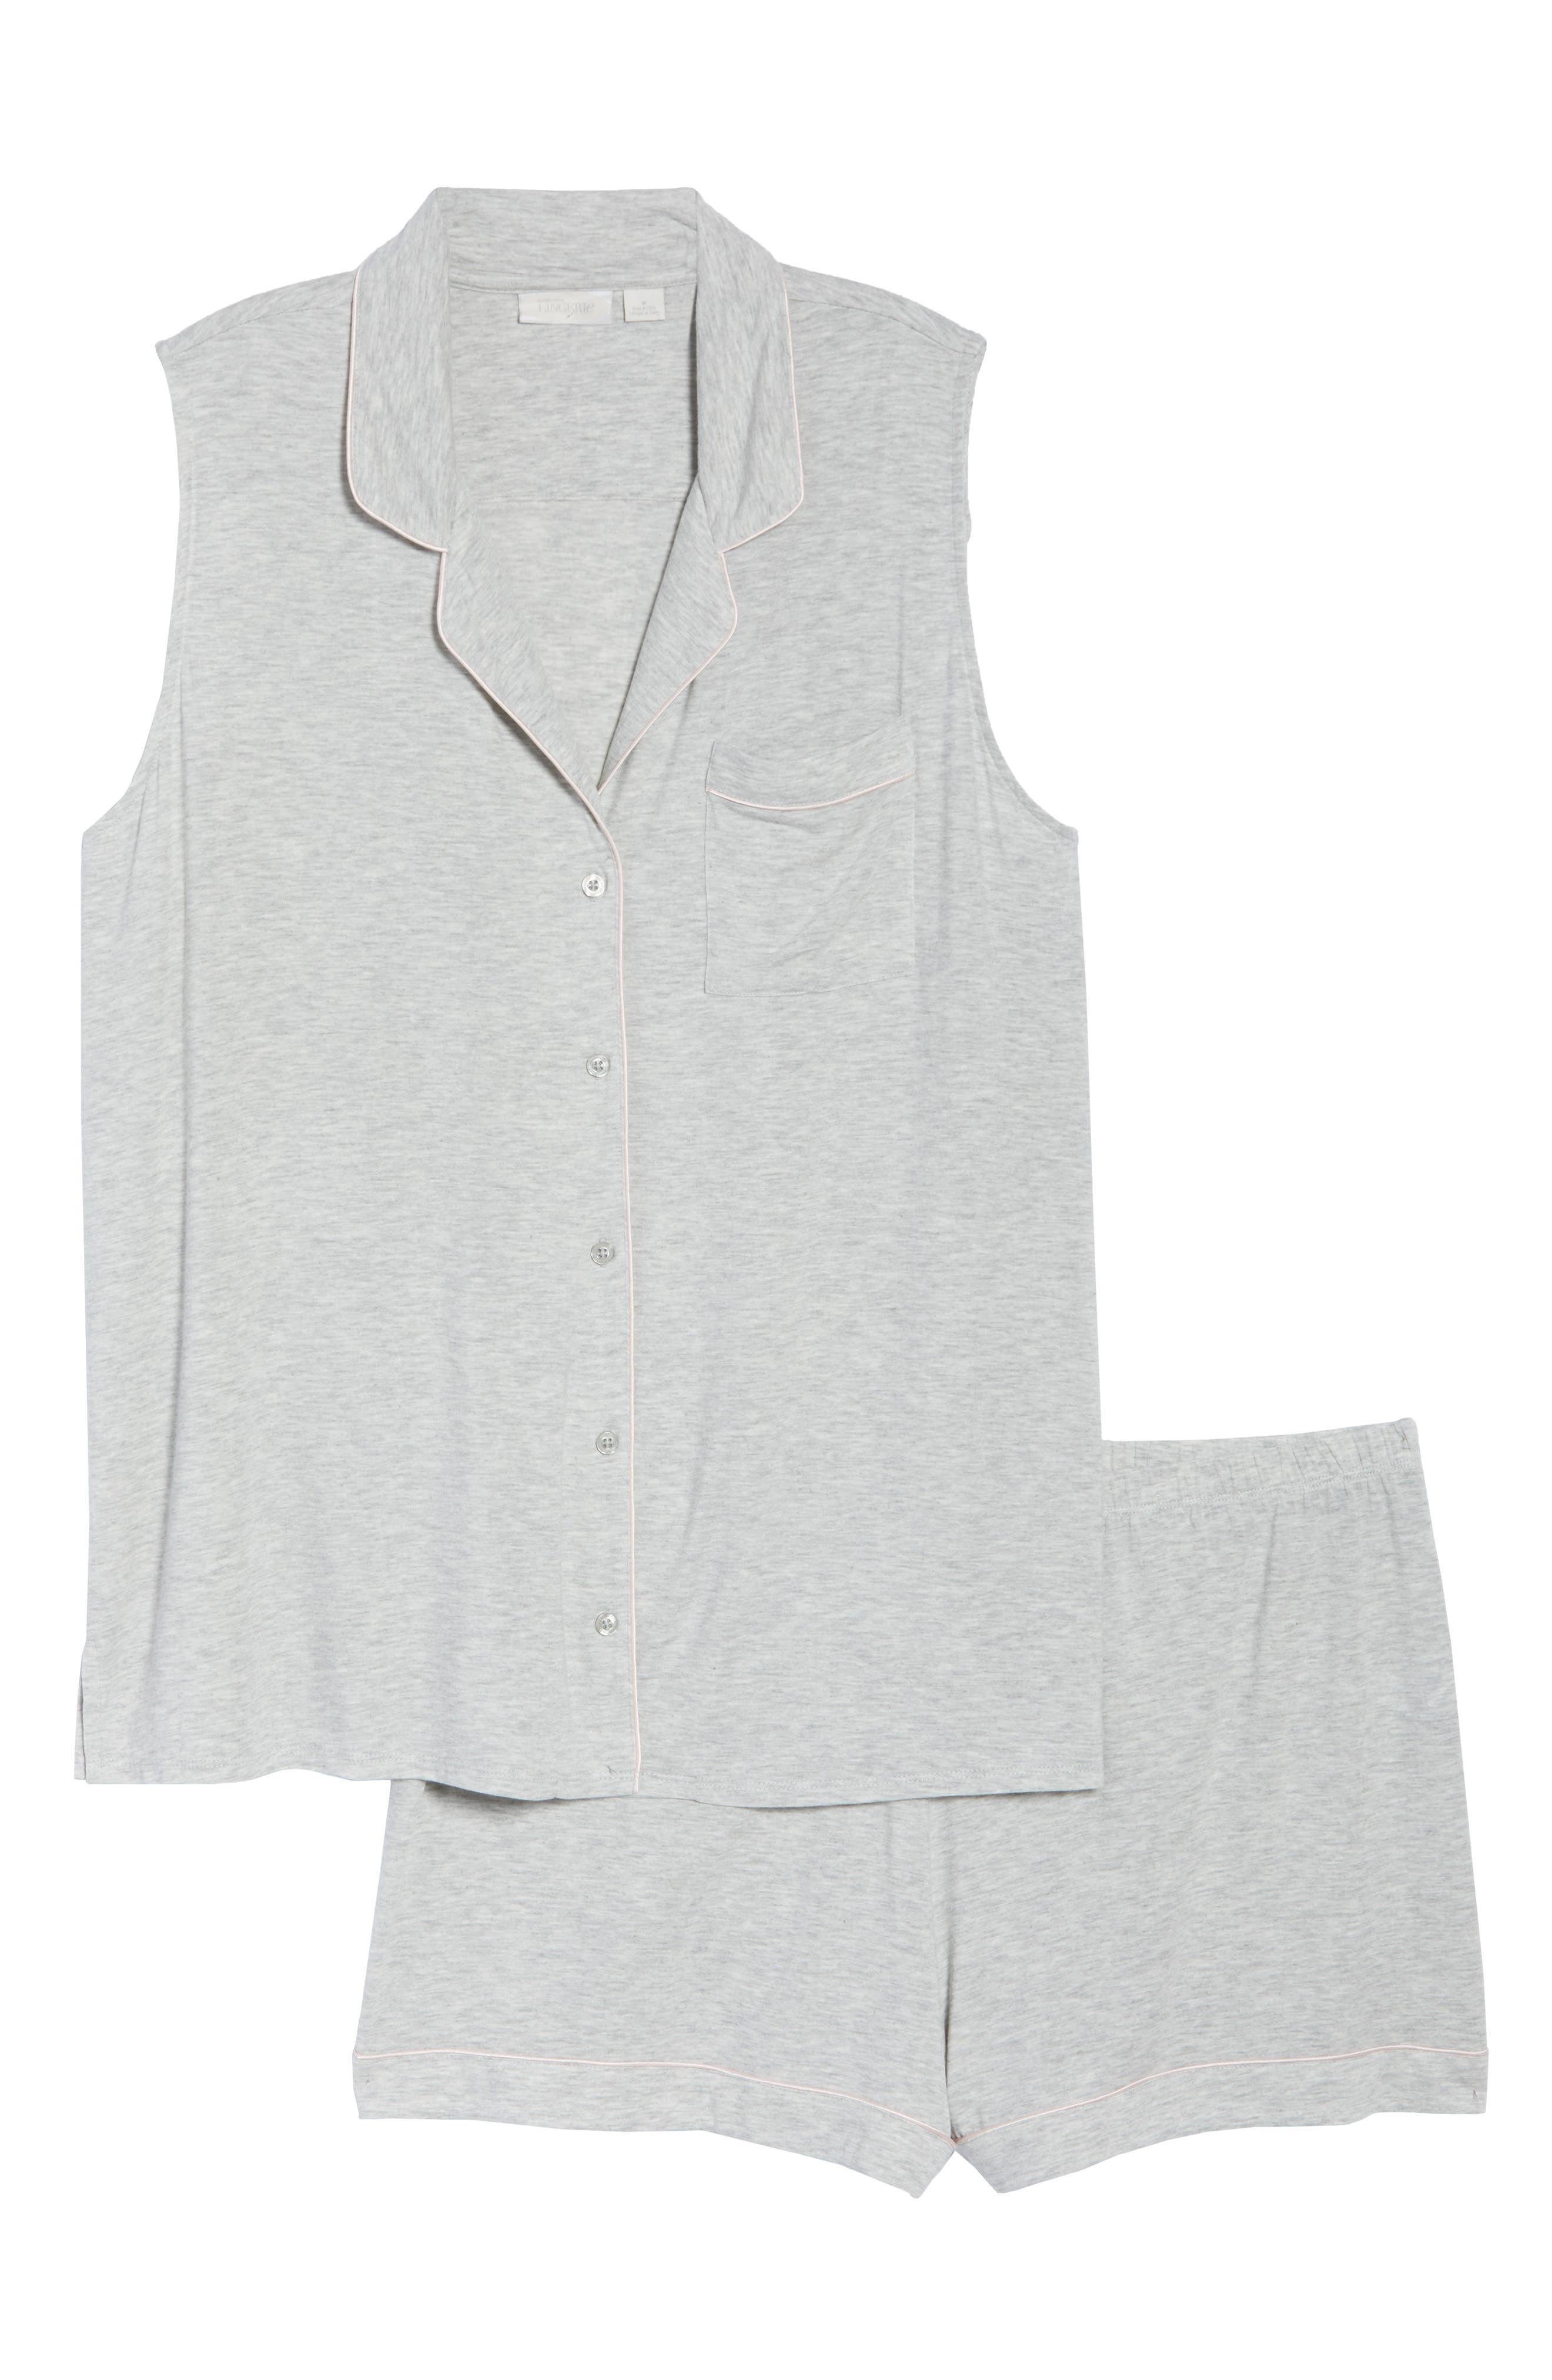 NORDSTROM LINGERIE, Moonlight Short Pajamas, Alternate thumbnail 6, color, GREY PEARL HEATHER